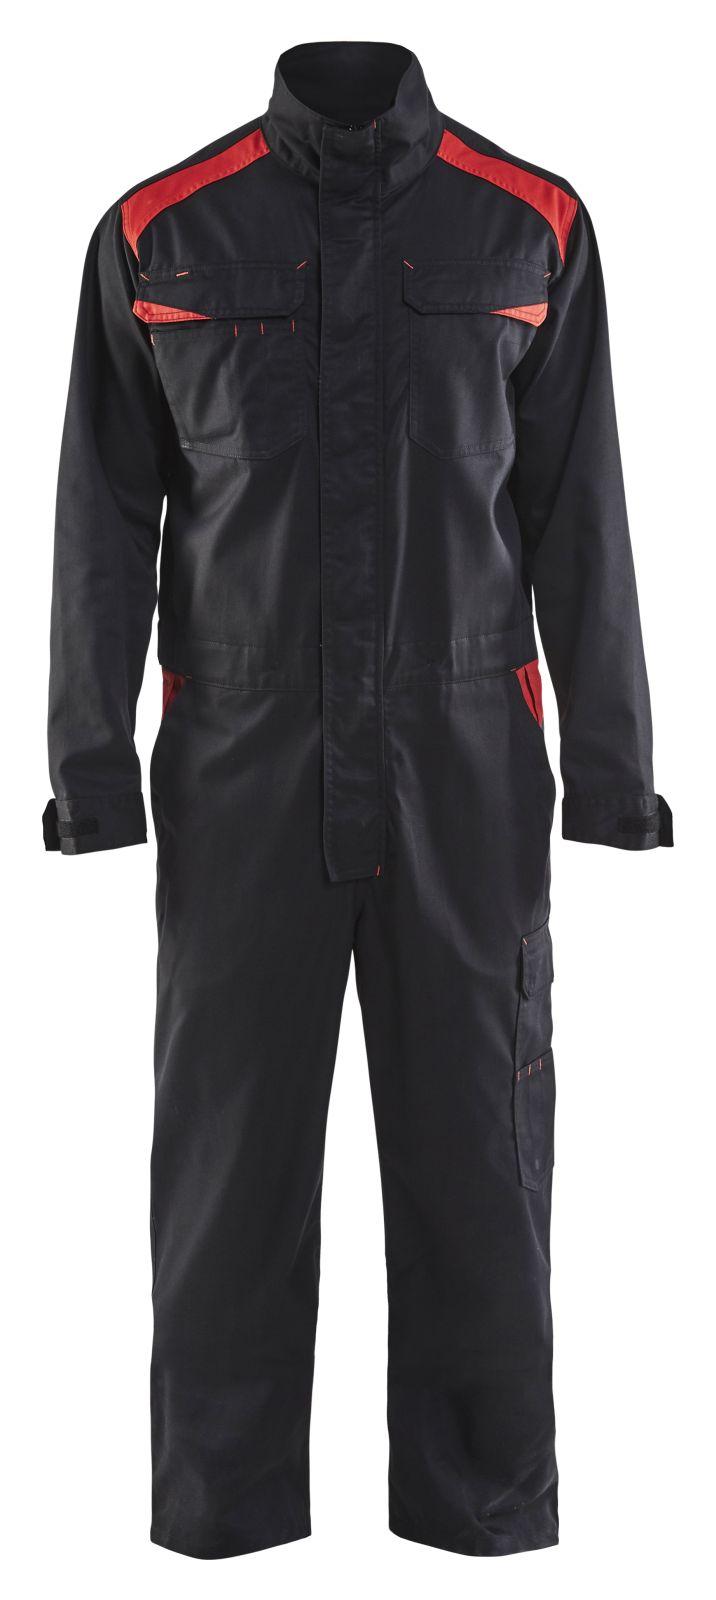 Blaklader Overalls 60541800 zwart-rood(9956)